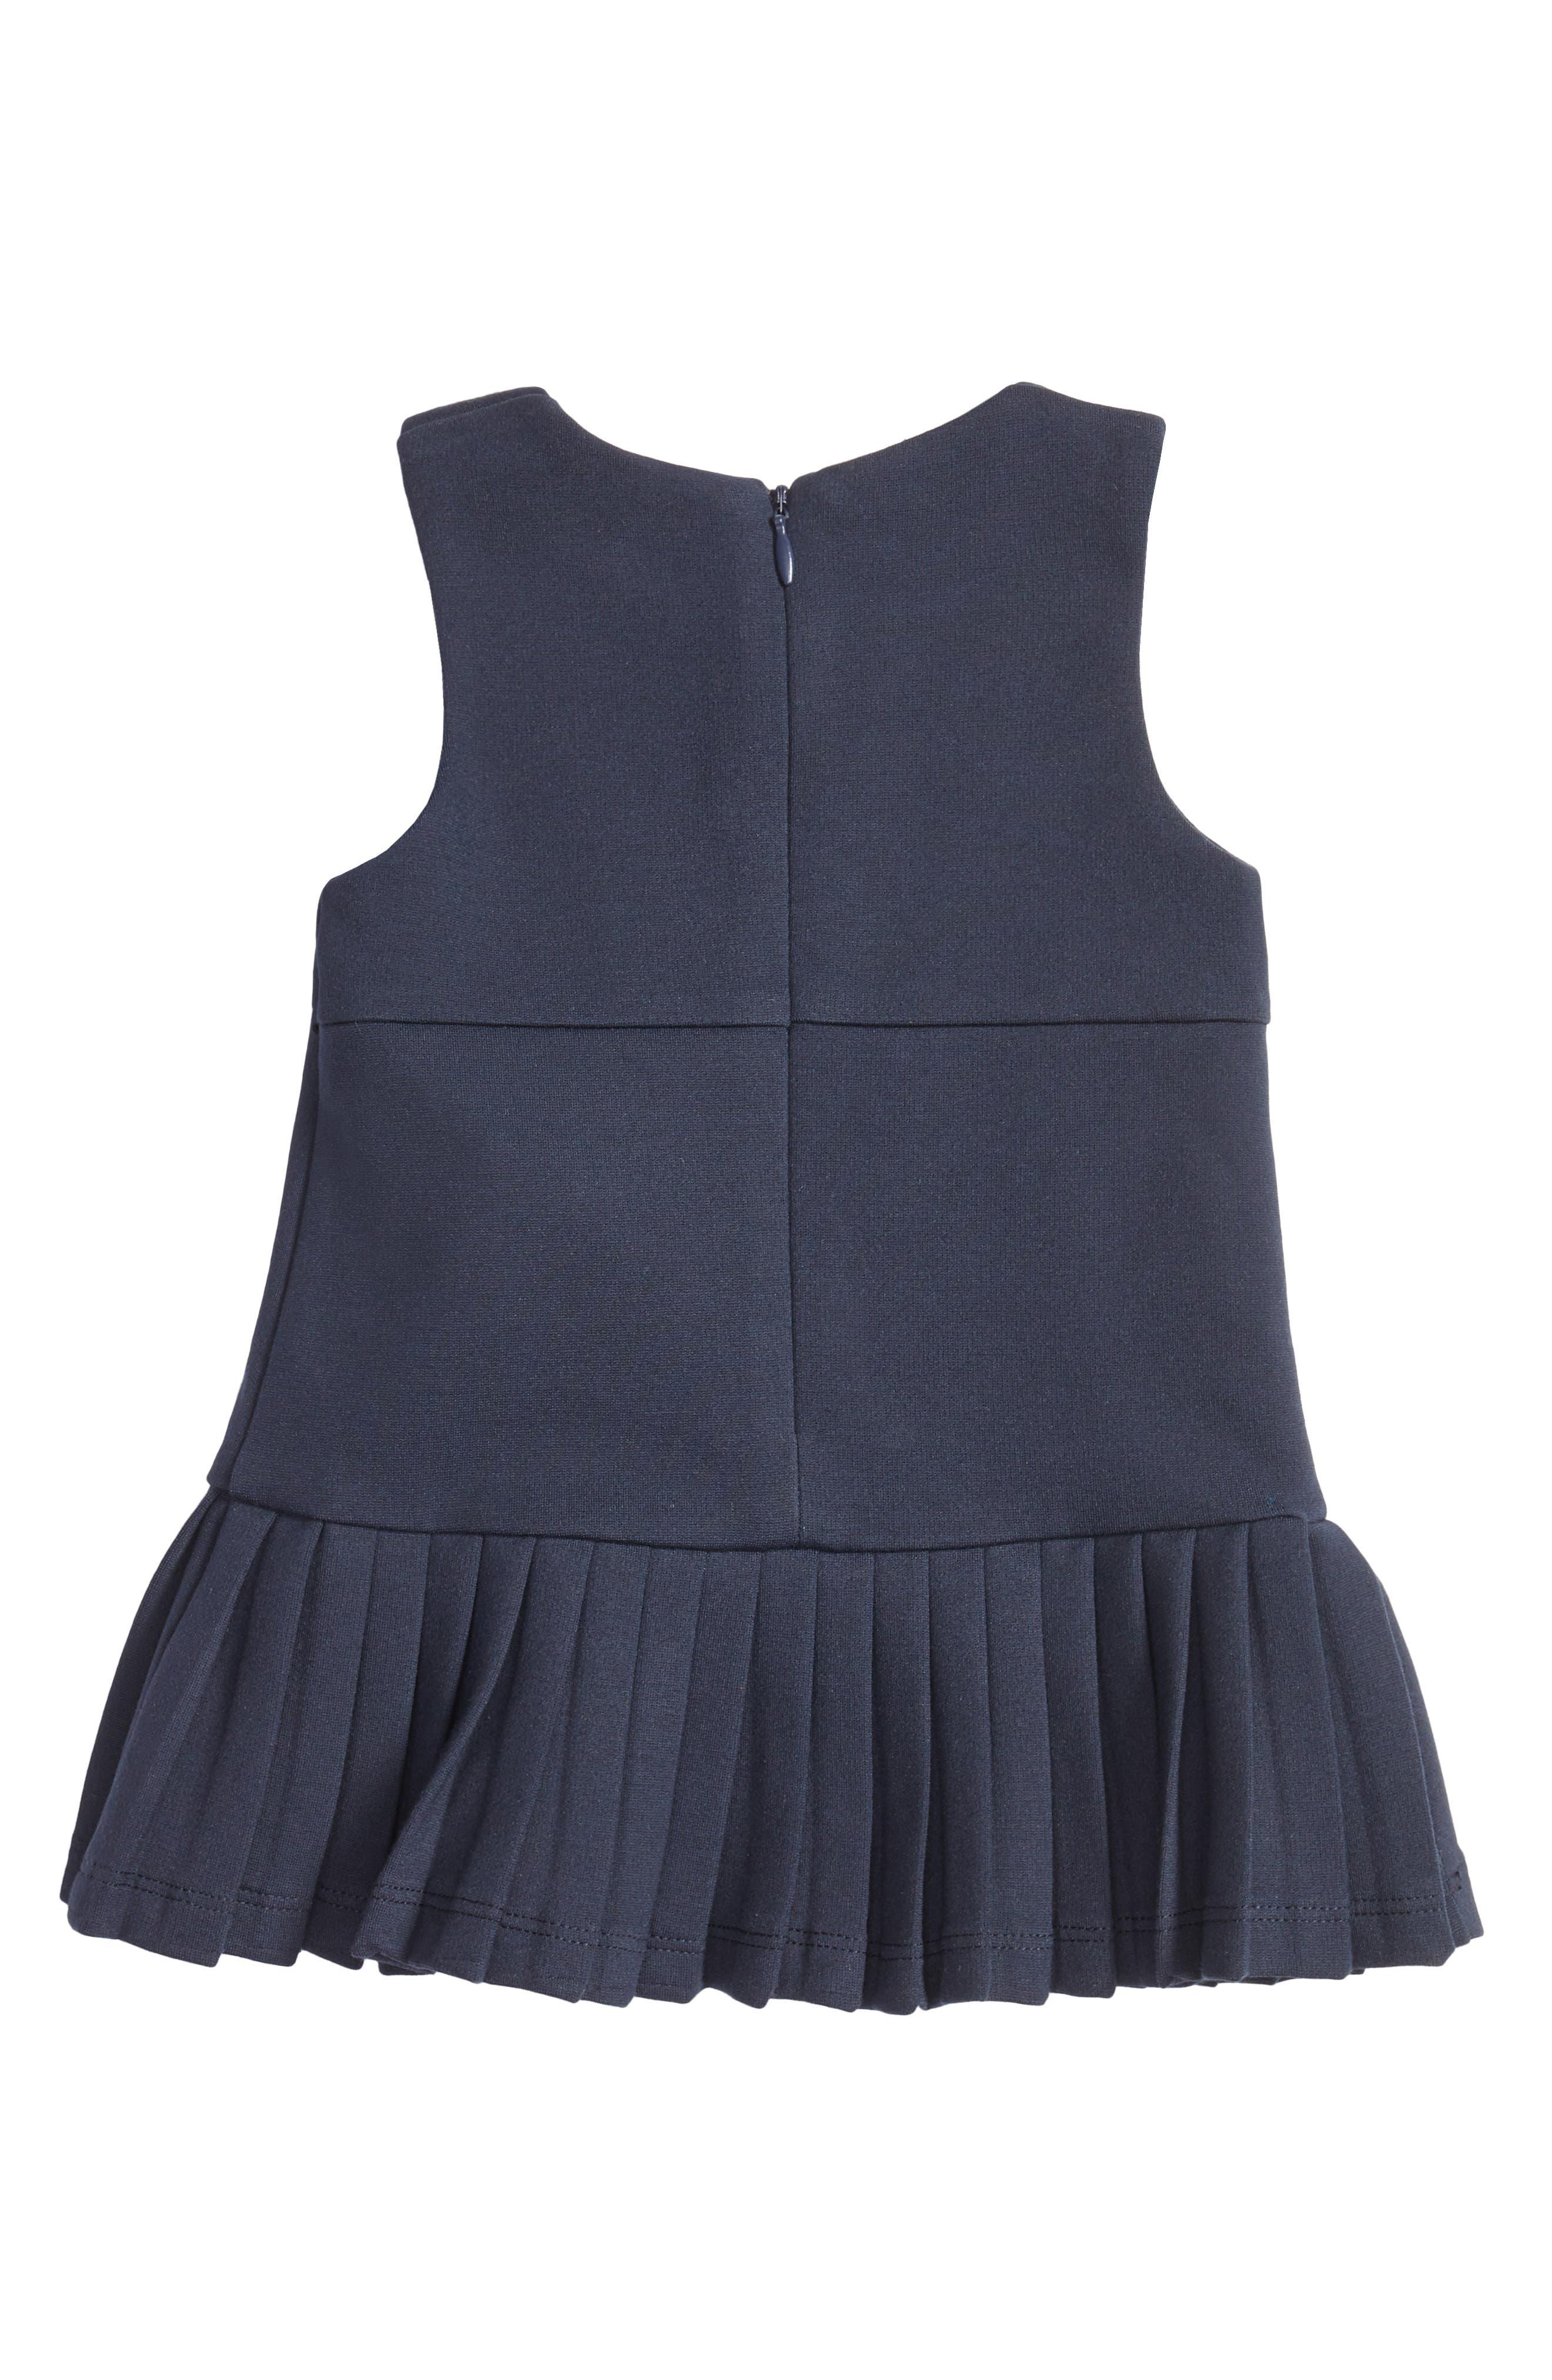 Sleeveless Jersey Dress,                             Alternate thumbnail 2, color,                             Navy Blue